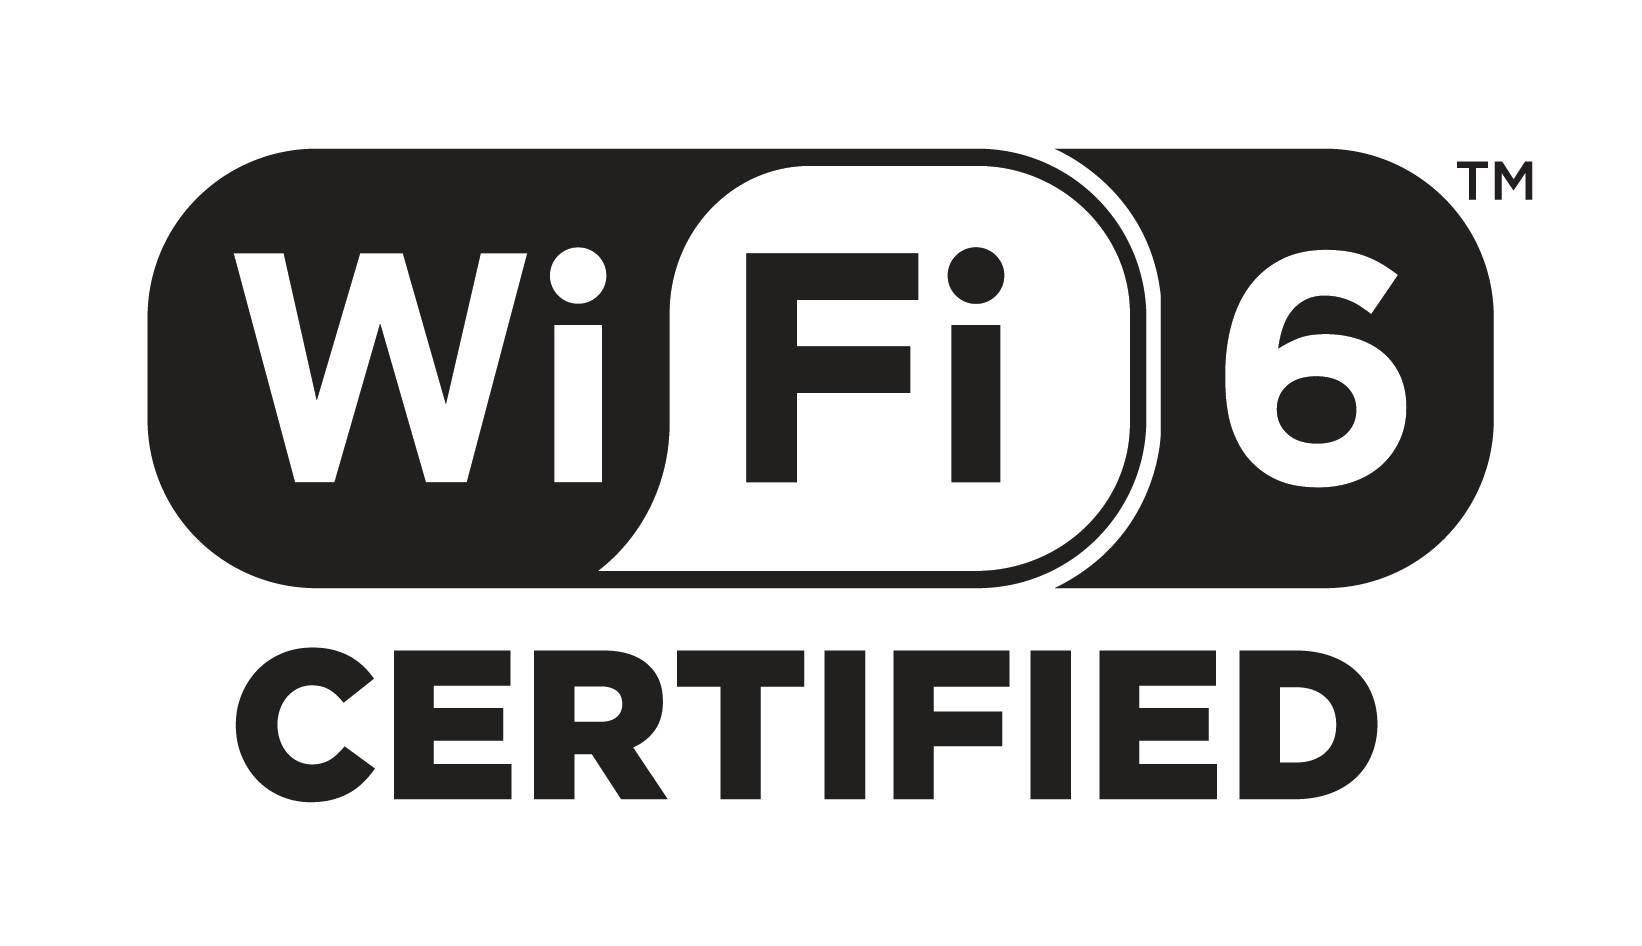 Wi-Fi_CERTIFIED_6